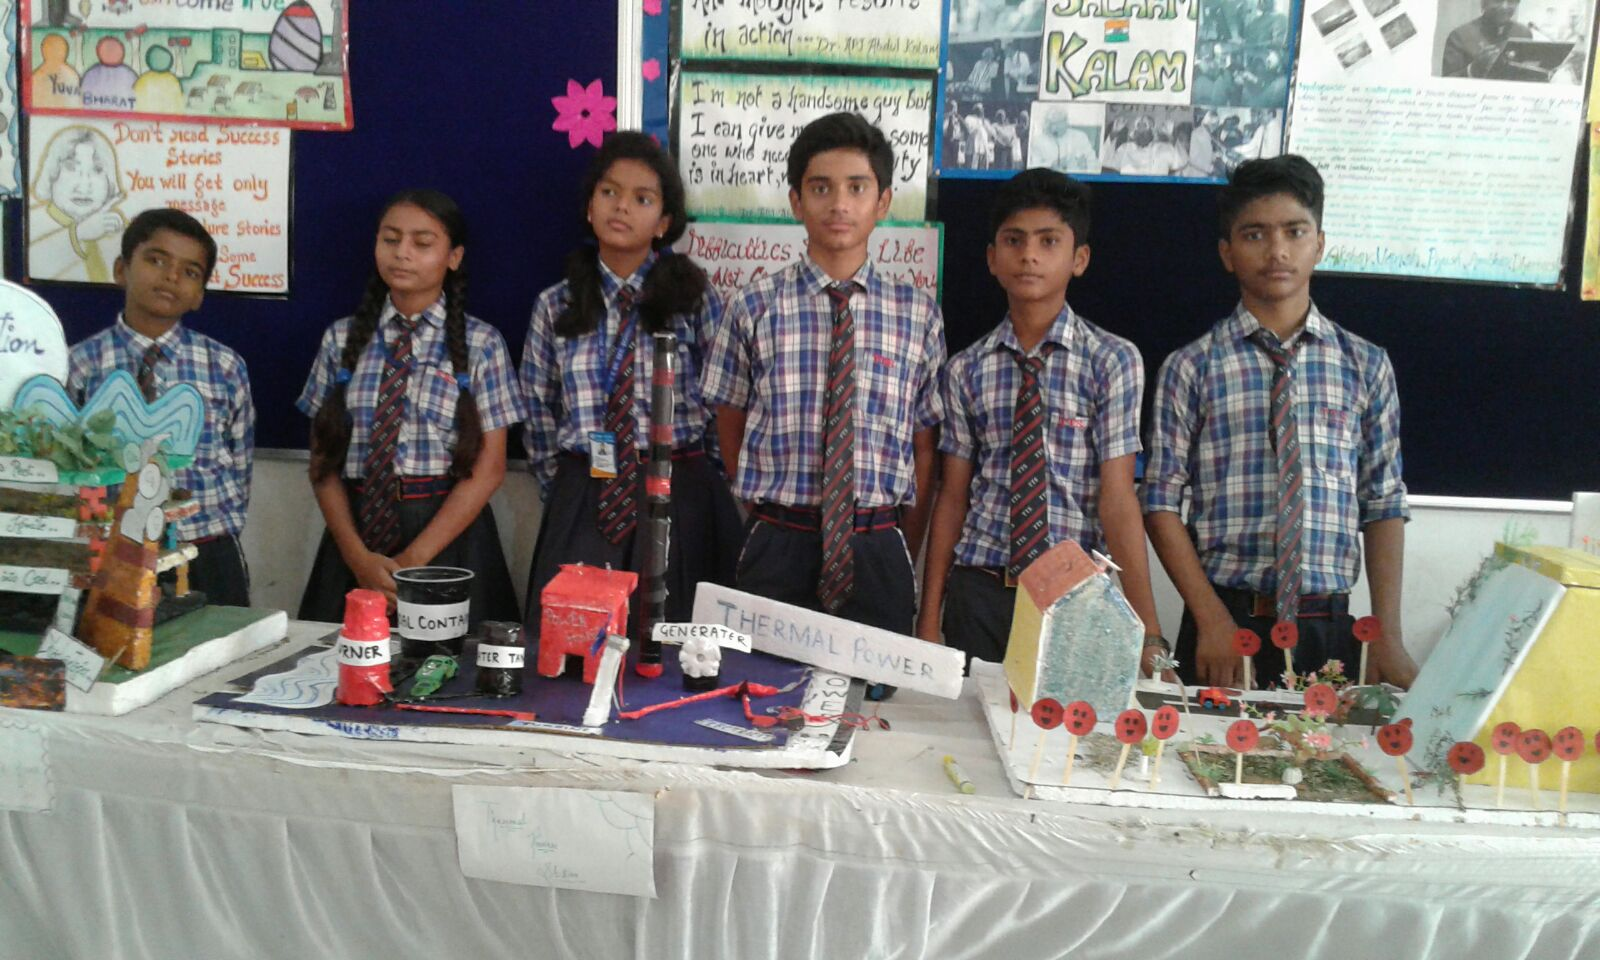 92/2e/-i-am-kalam-science-exhibition-in-kerala.jpg